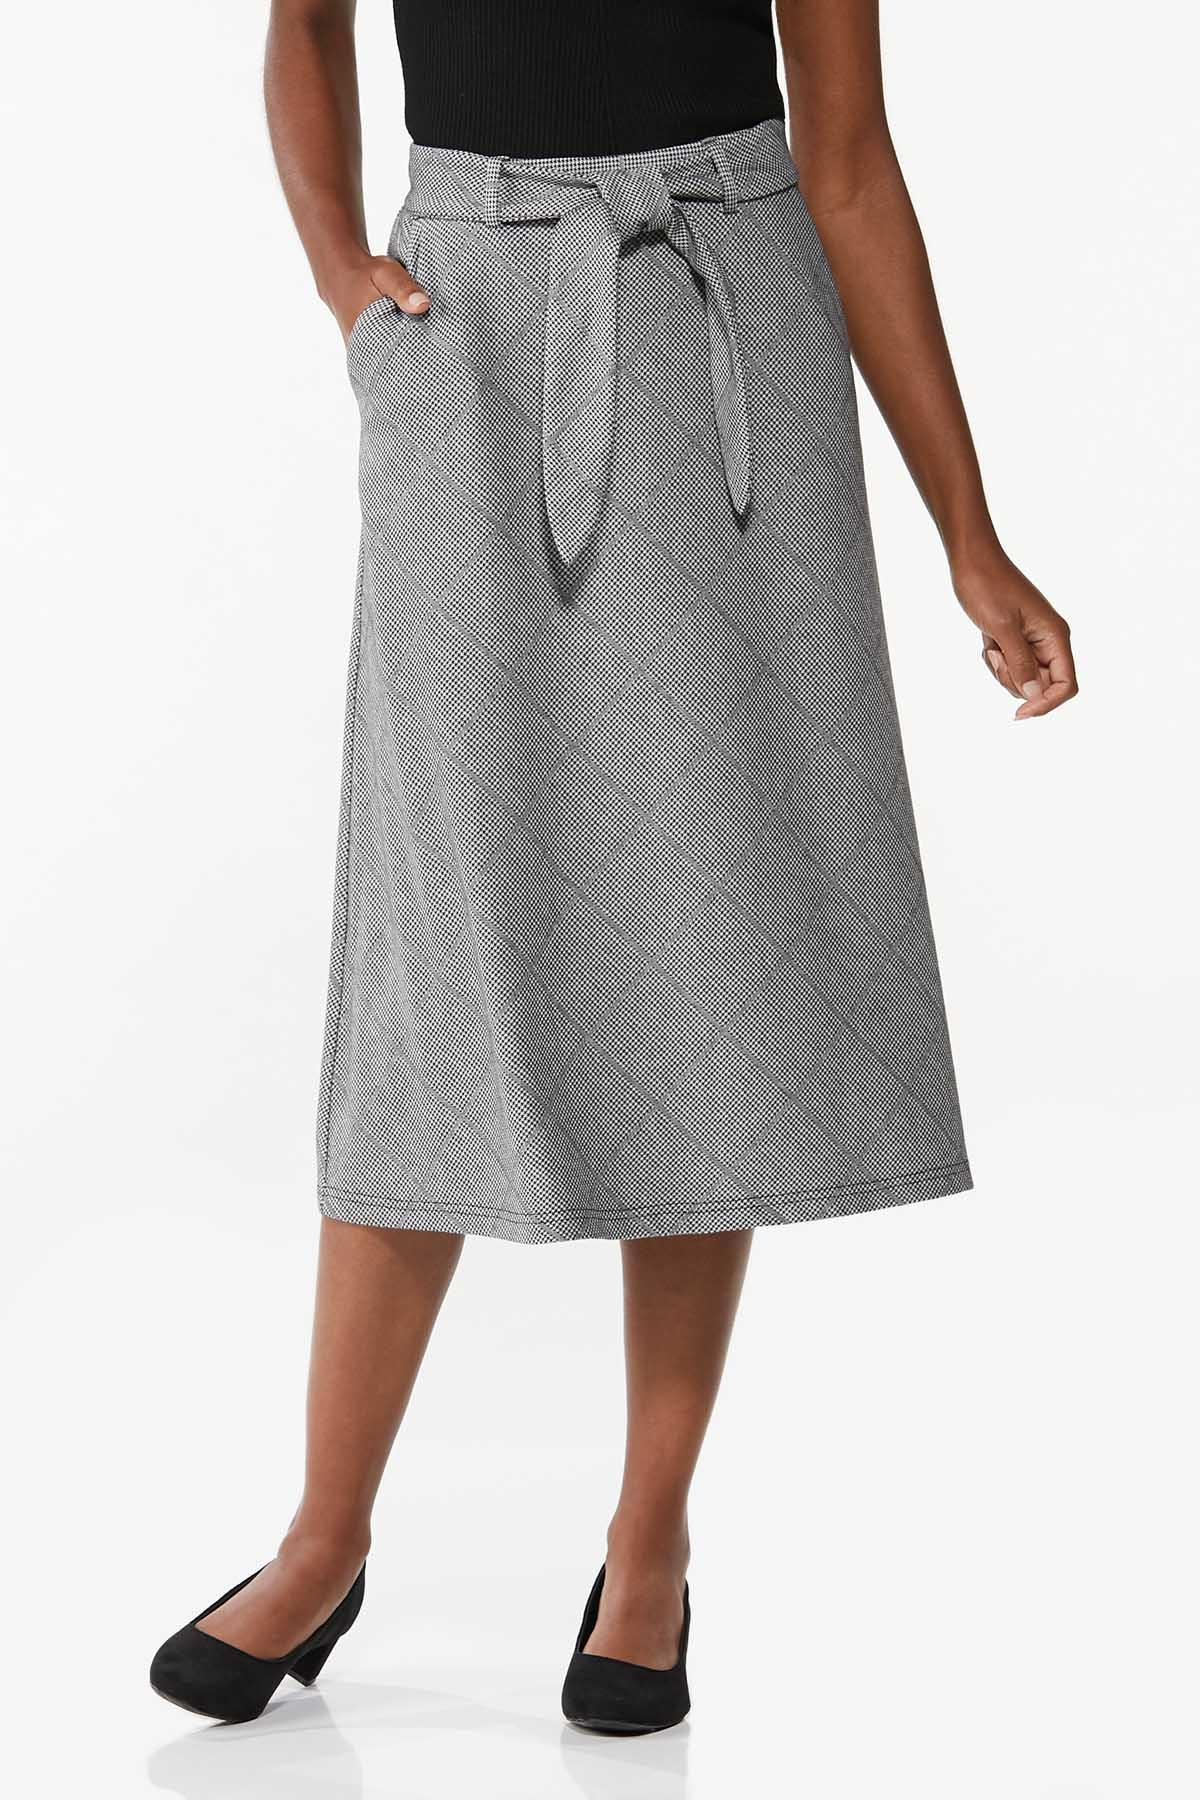 Houndstooth Midi Skirt (Item #44719396)